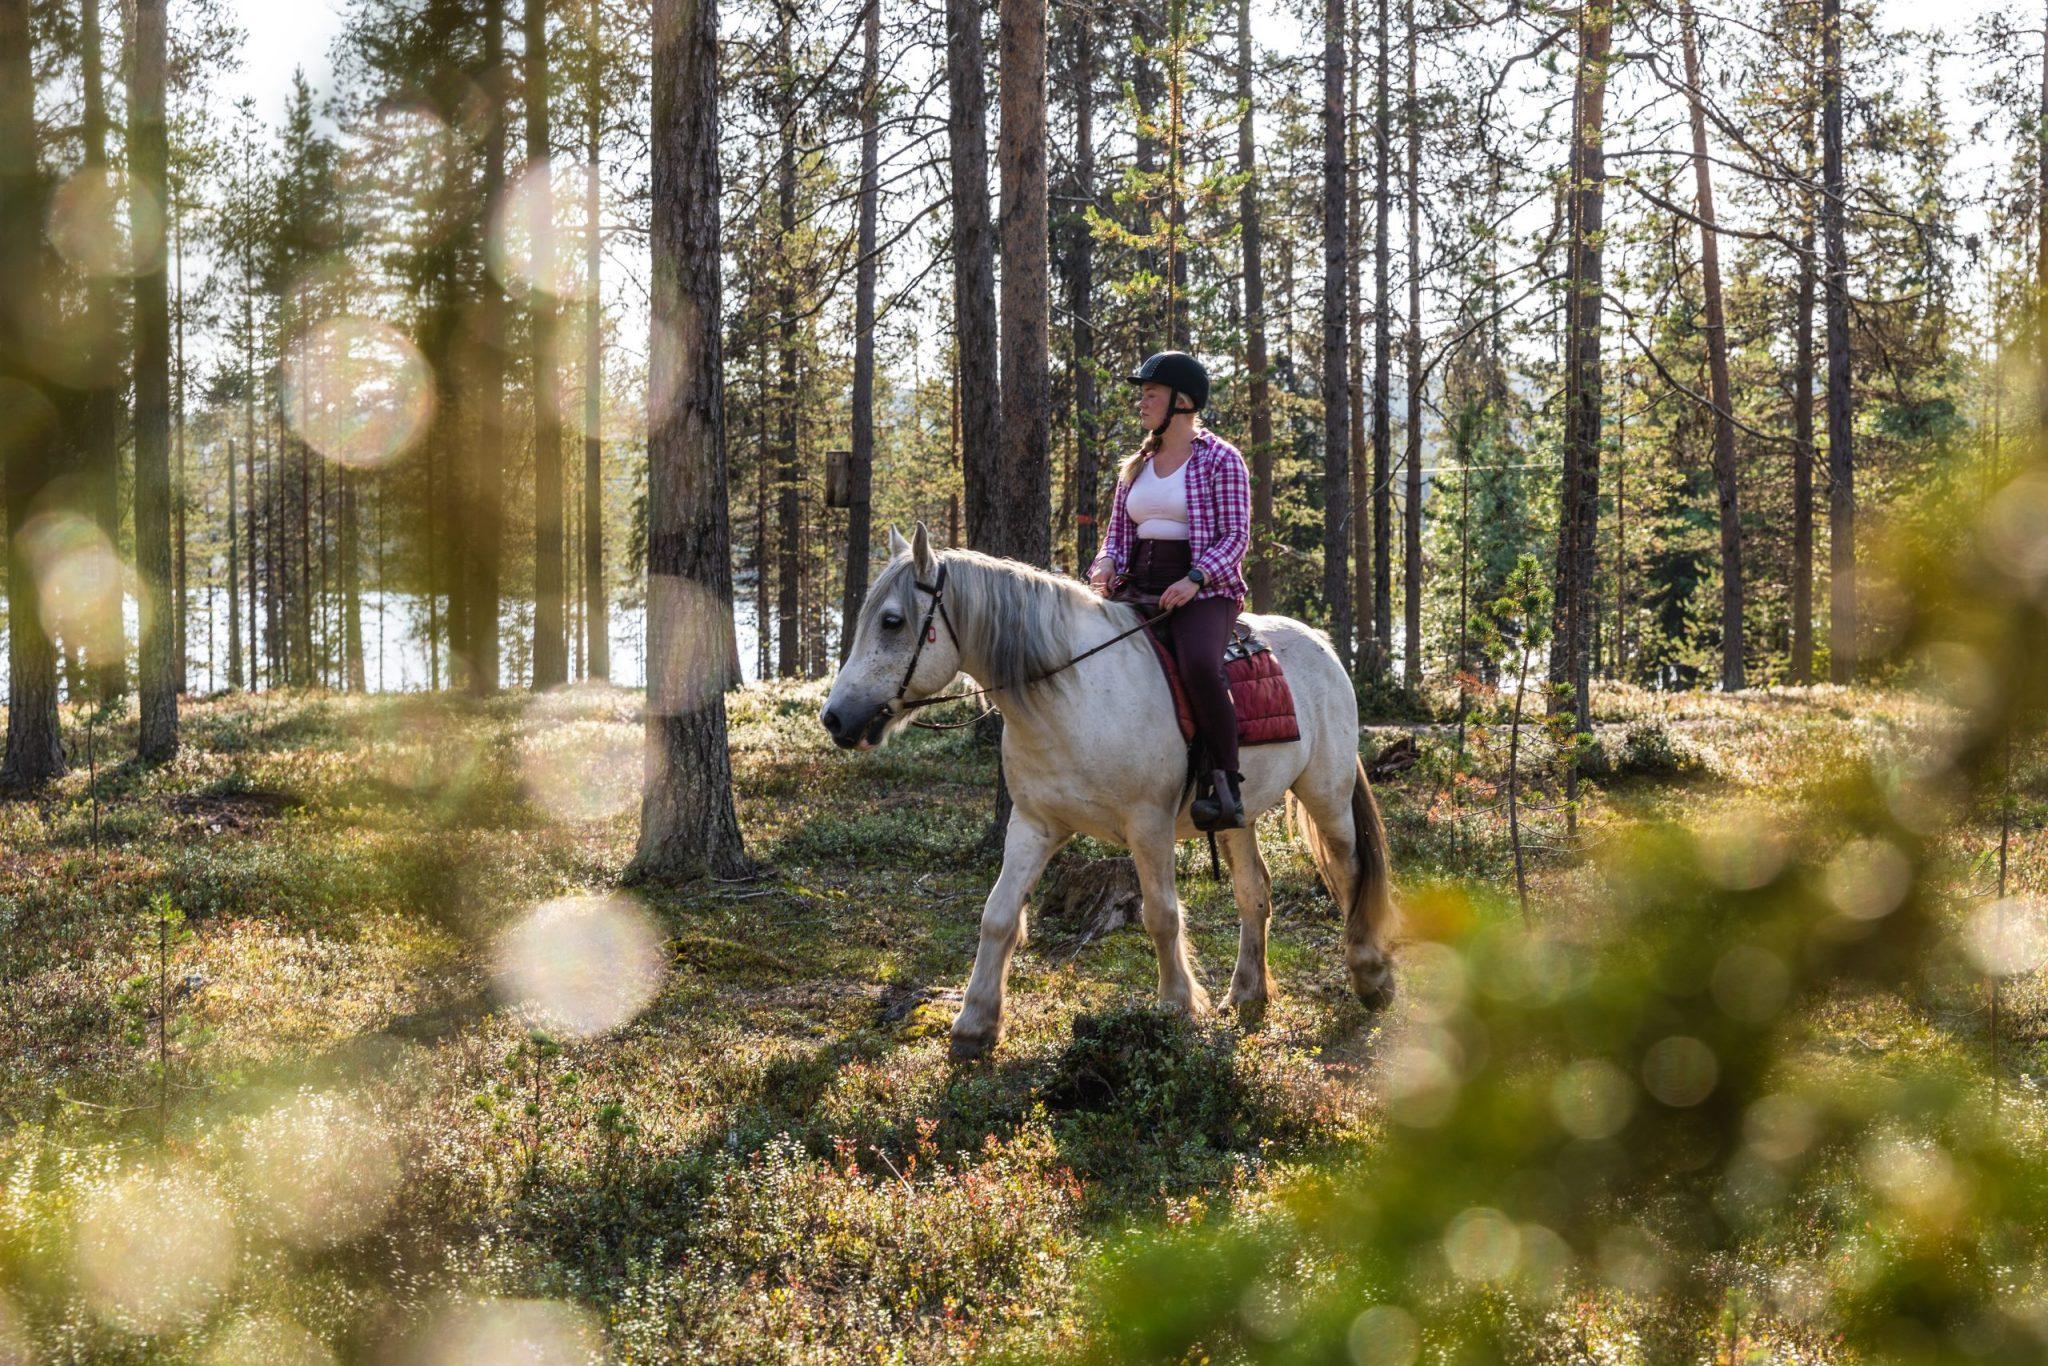 Horseback riding DiscoverMuonio Activities Horses Photo by House of Lapland Terhi Tuovinen